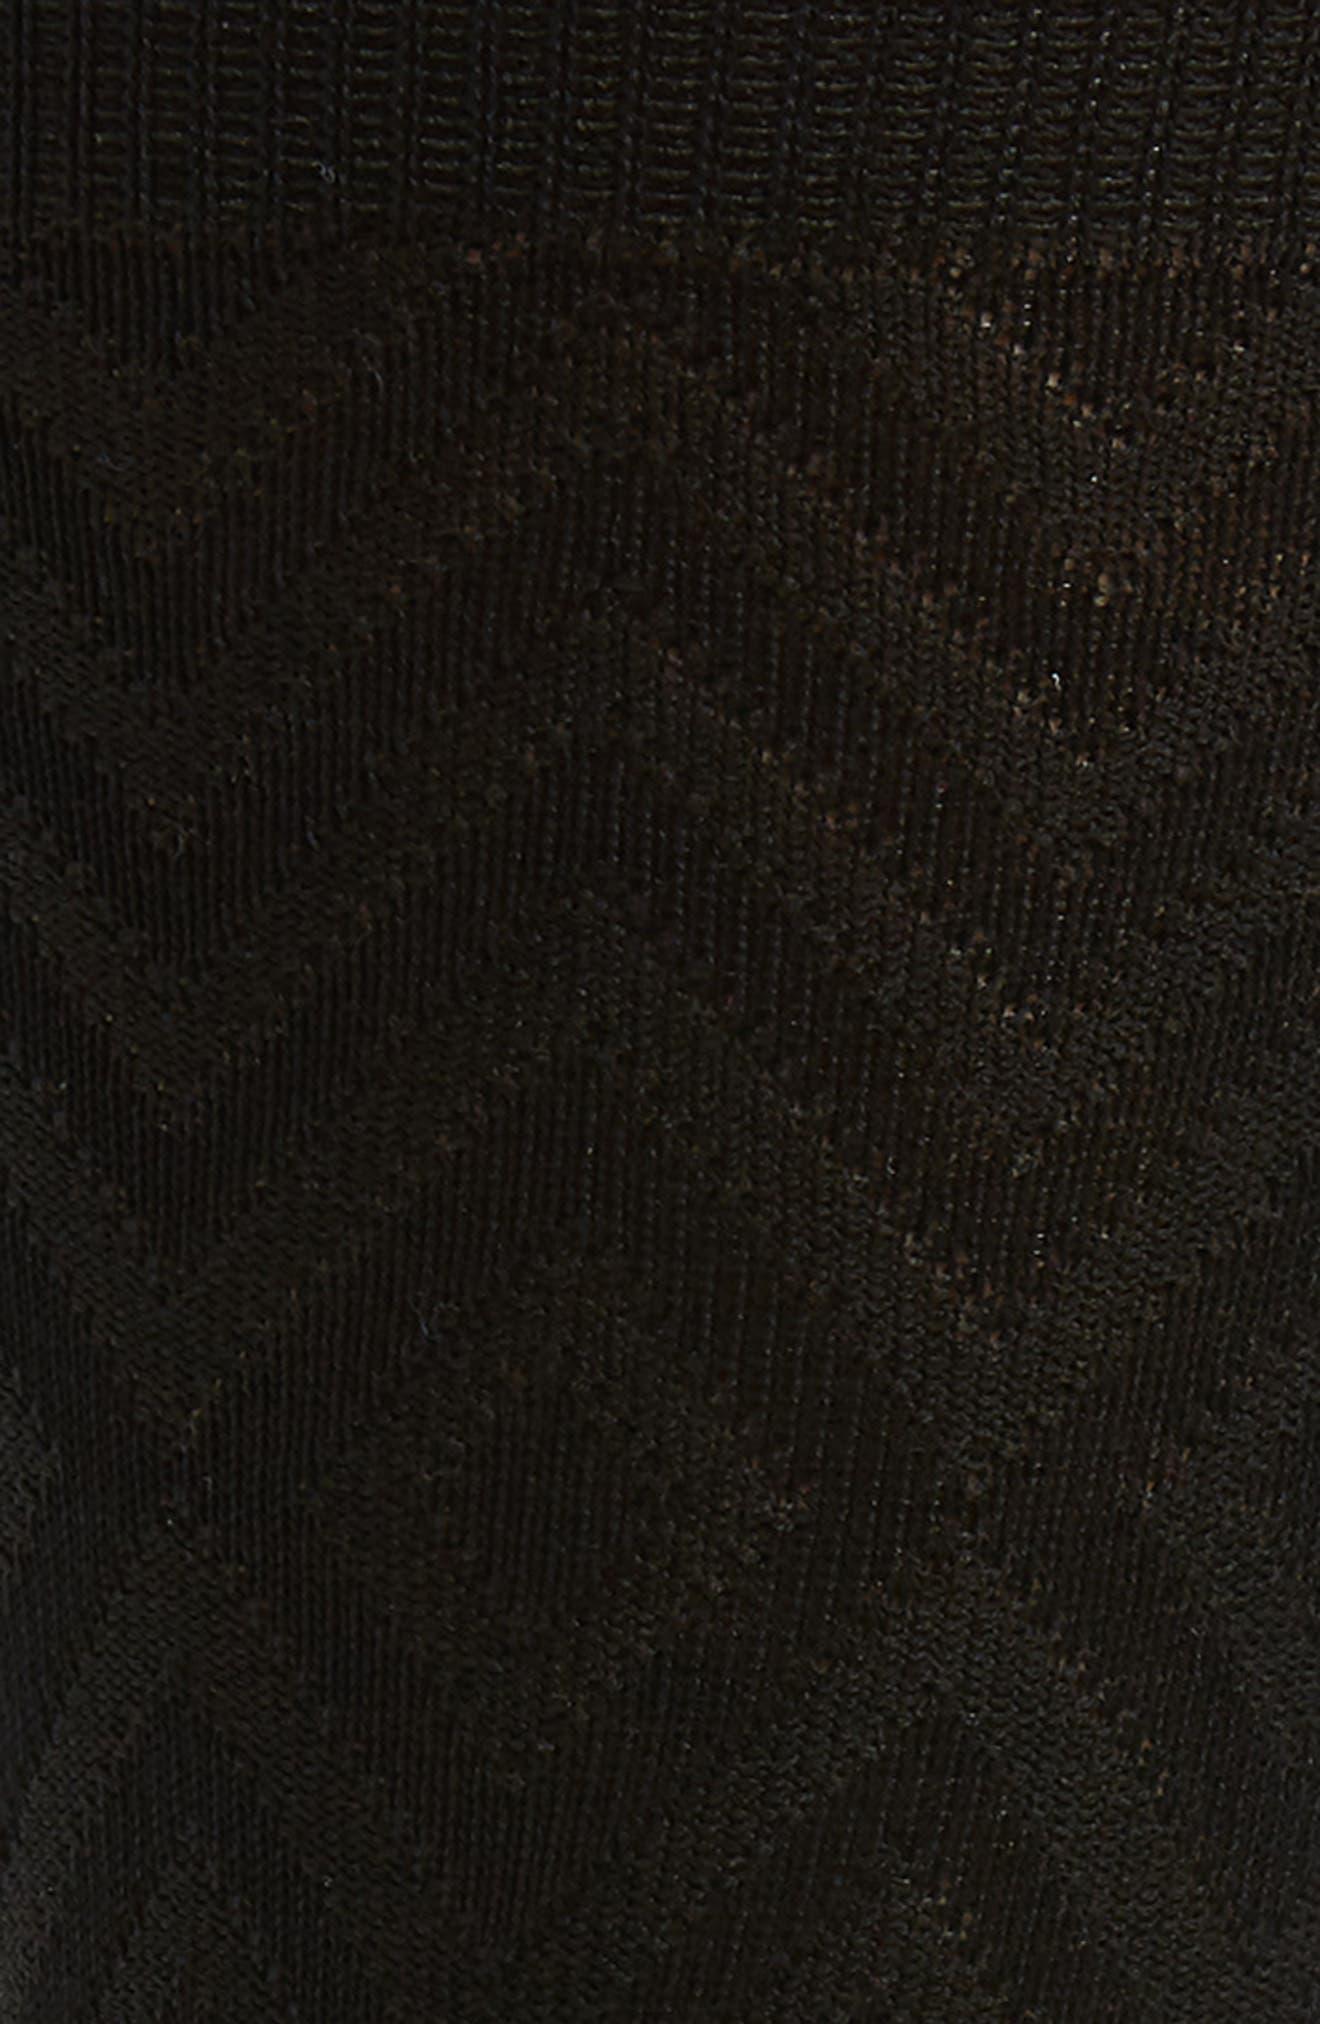 Chevron Socks,                             Alternate thumbnail 2, color,                             BLACK